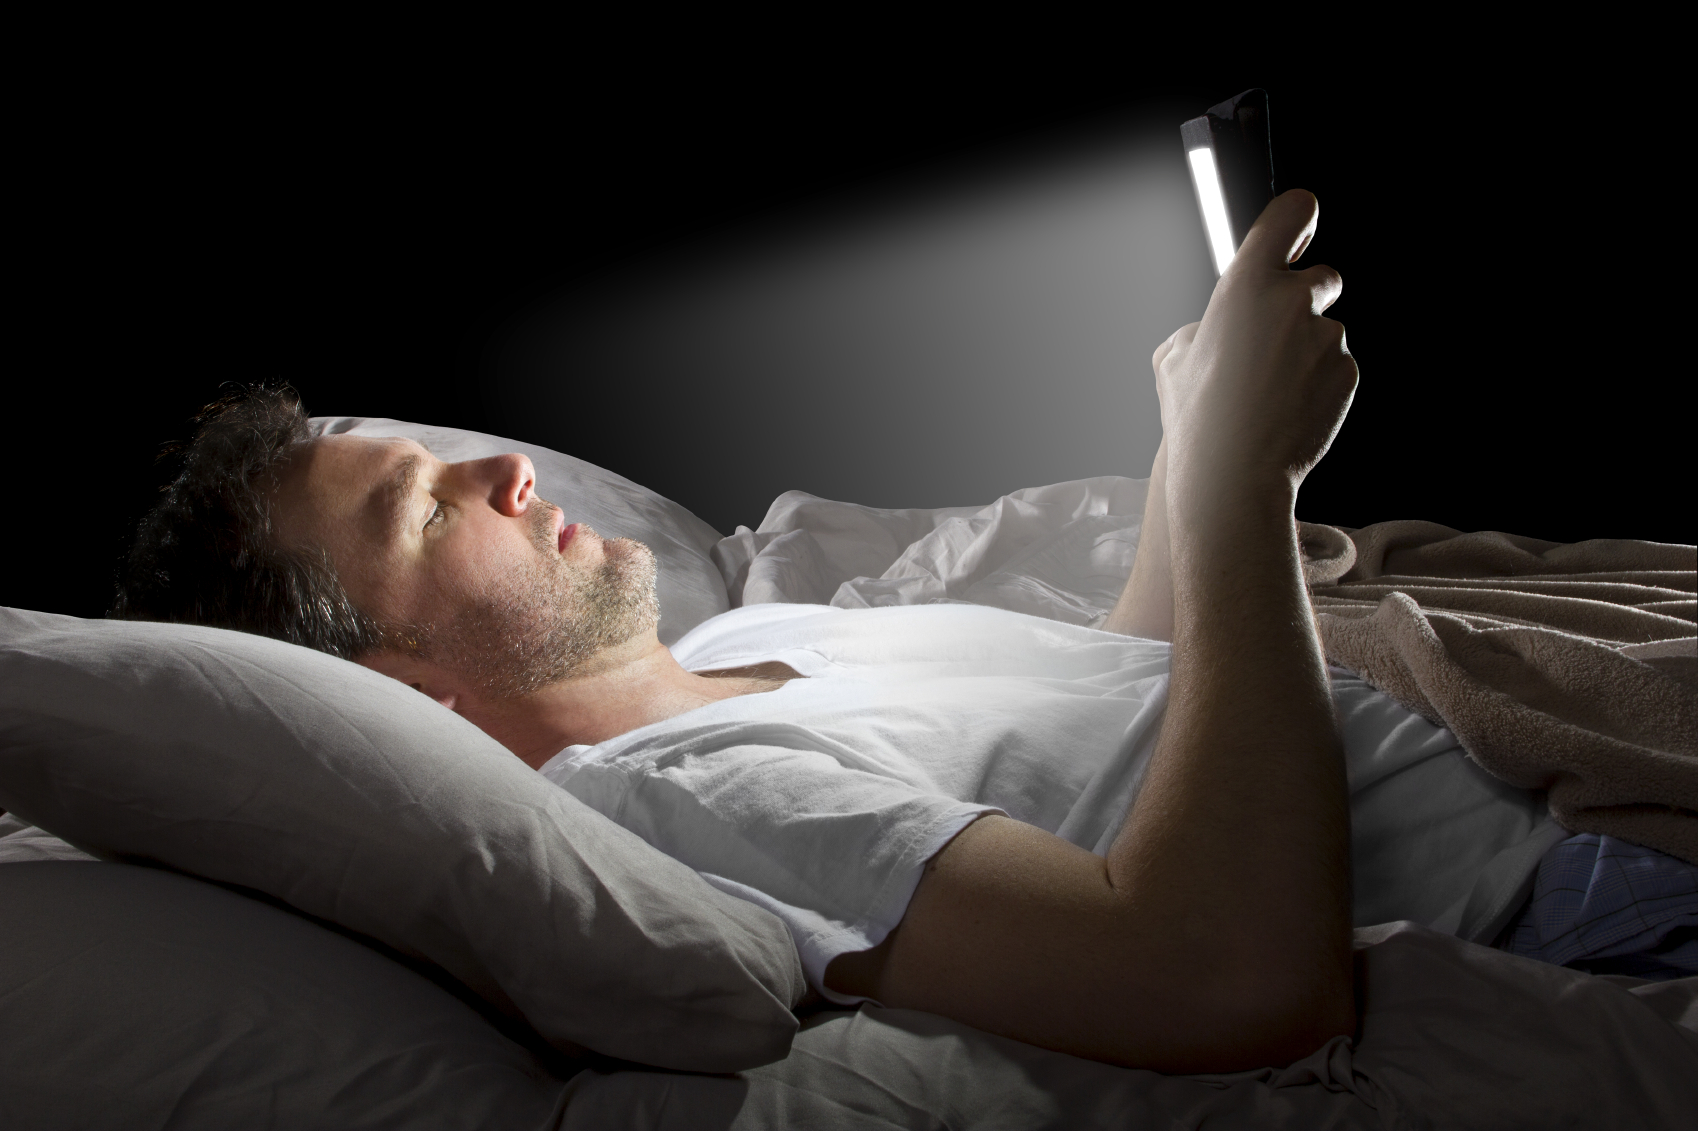 10 Bedtime Habits That Ruin Your Beauty Sleep